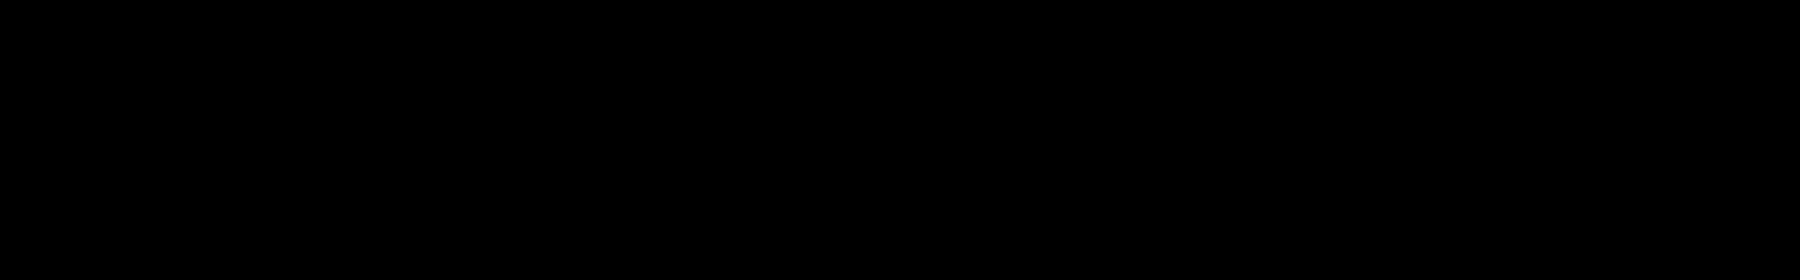 SINEE - MOVING GROUNDS audio waveform